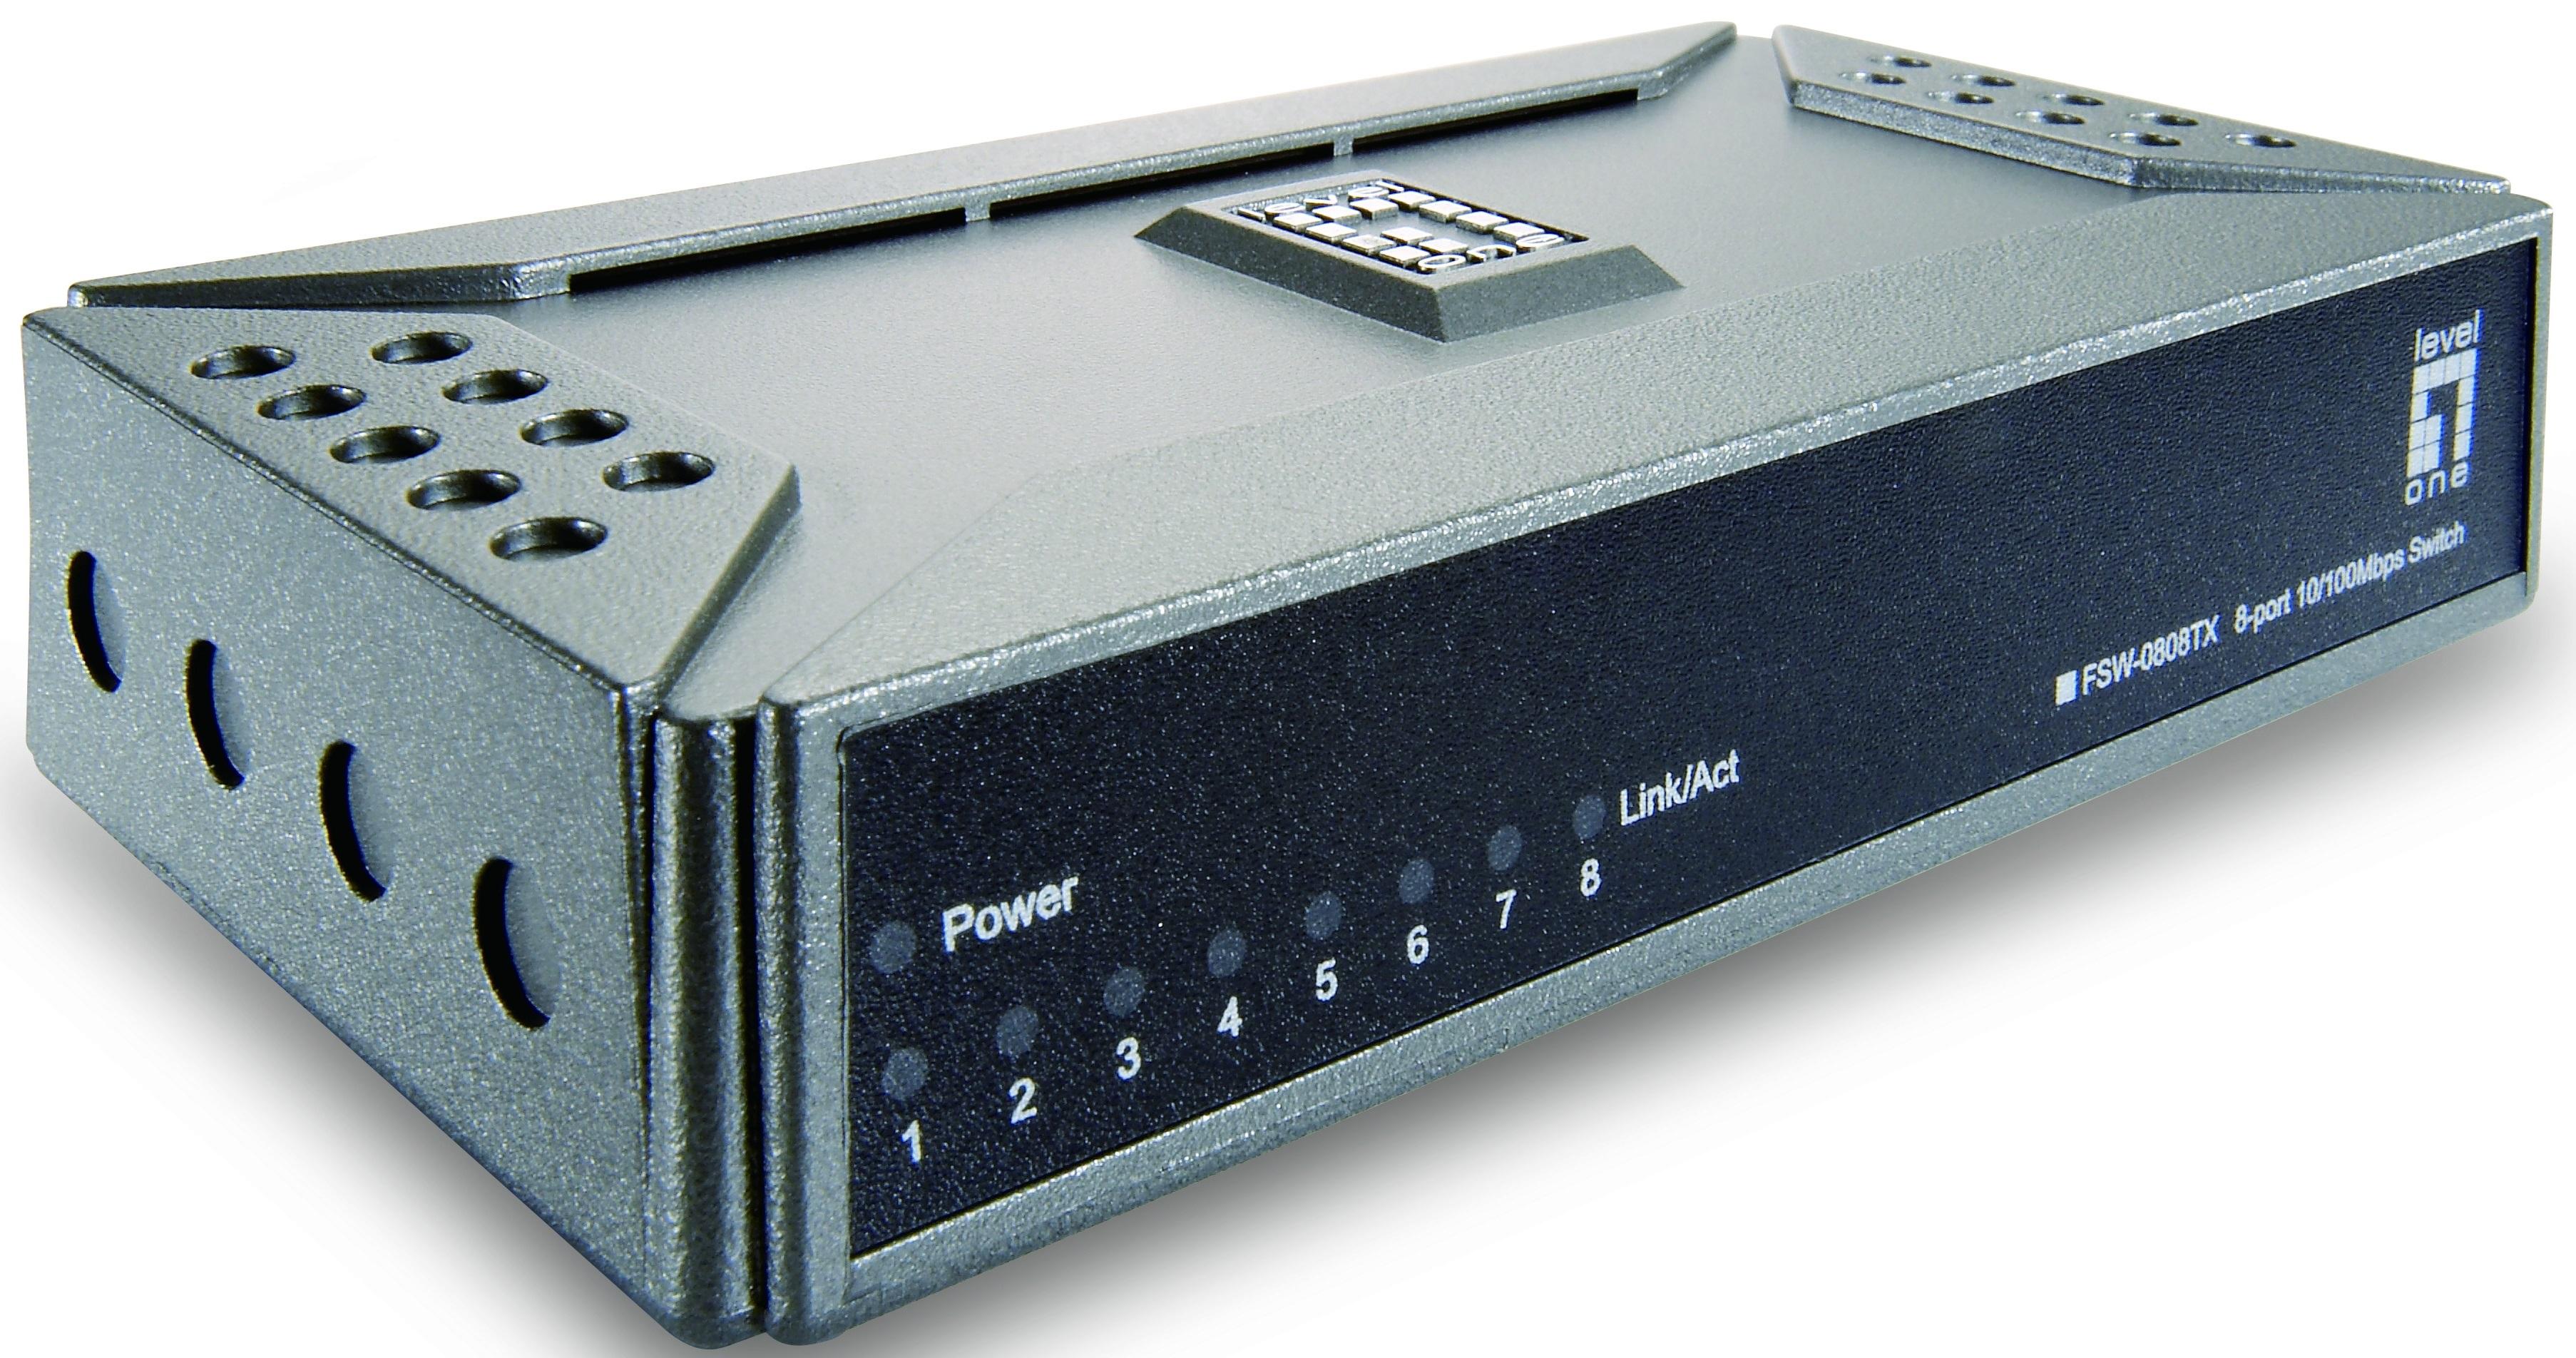 1 Stk Switch  8xRJ45 10/100, Leise, Lüfterlos, externes Netzteil QLFSW0808T